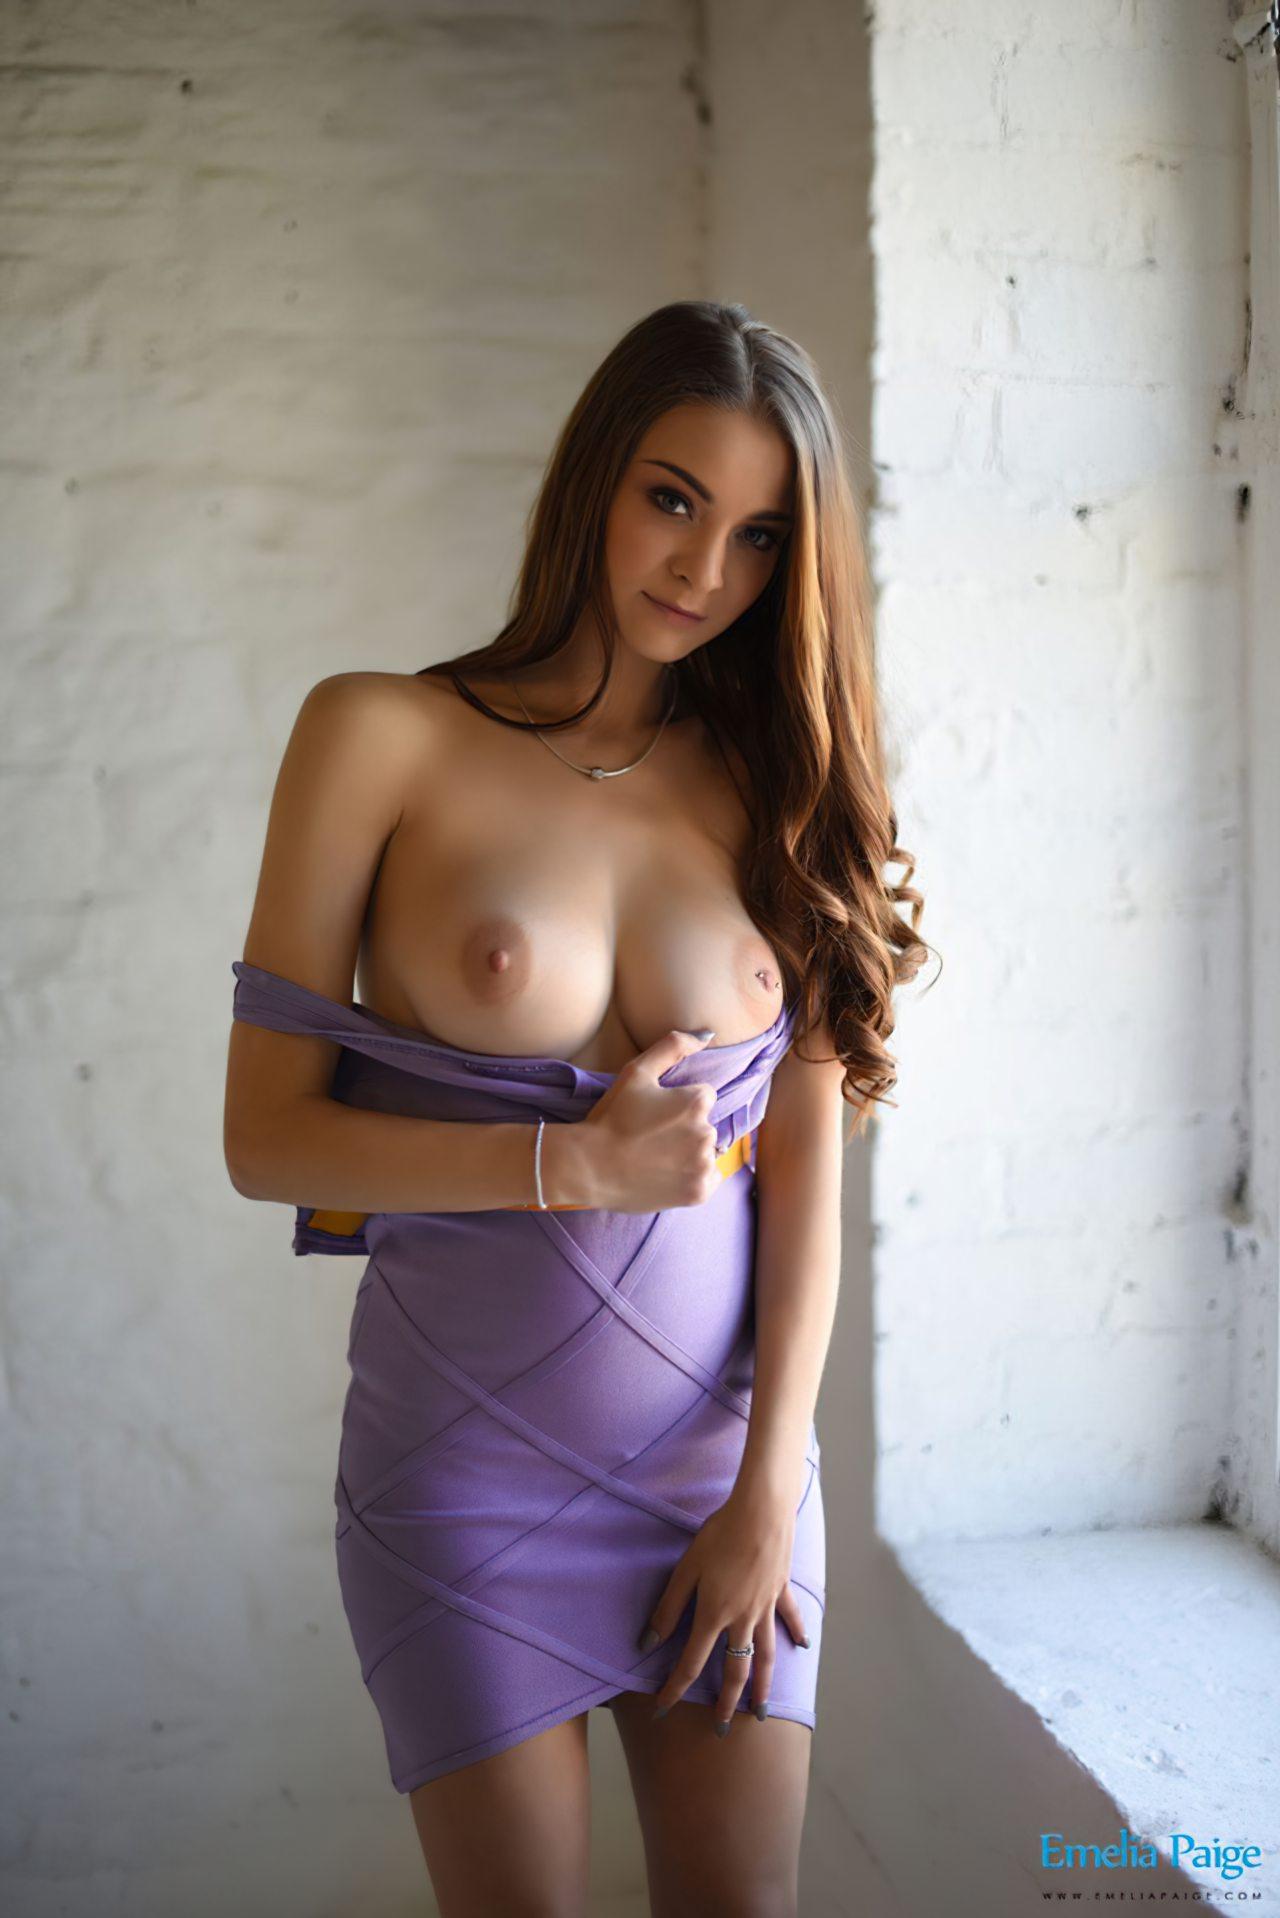 Fotos Mulheres Nuas (34)